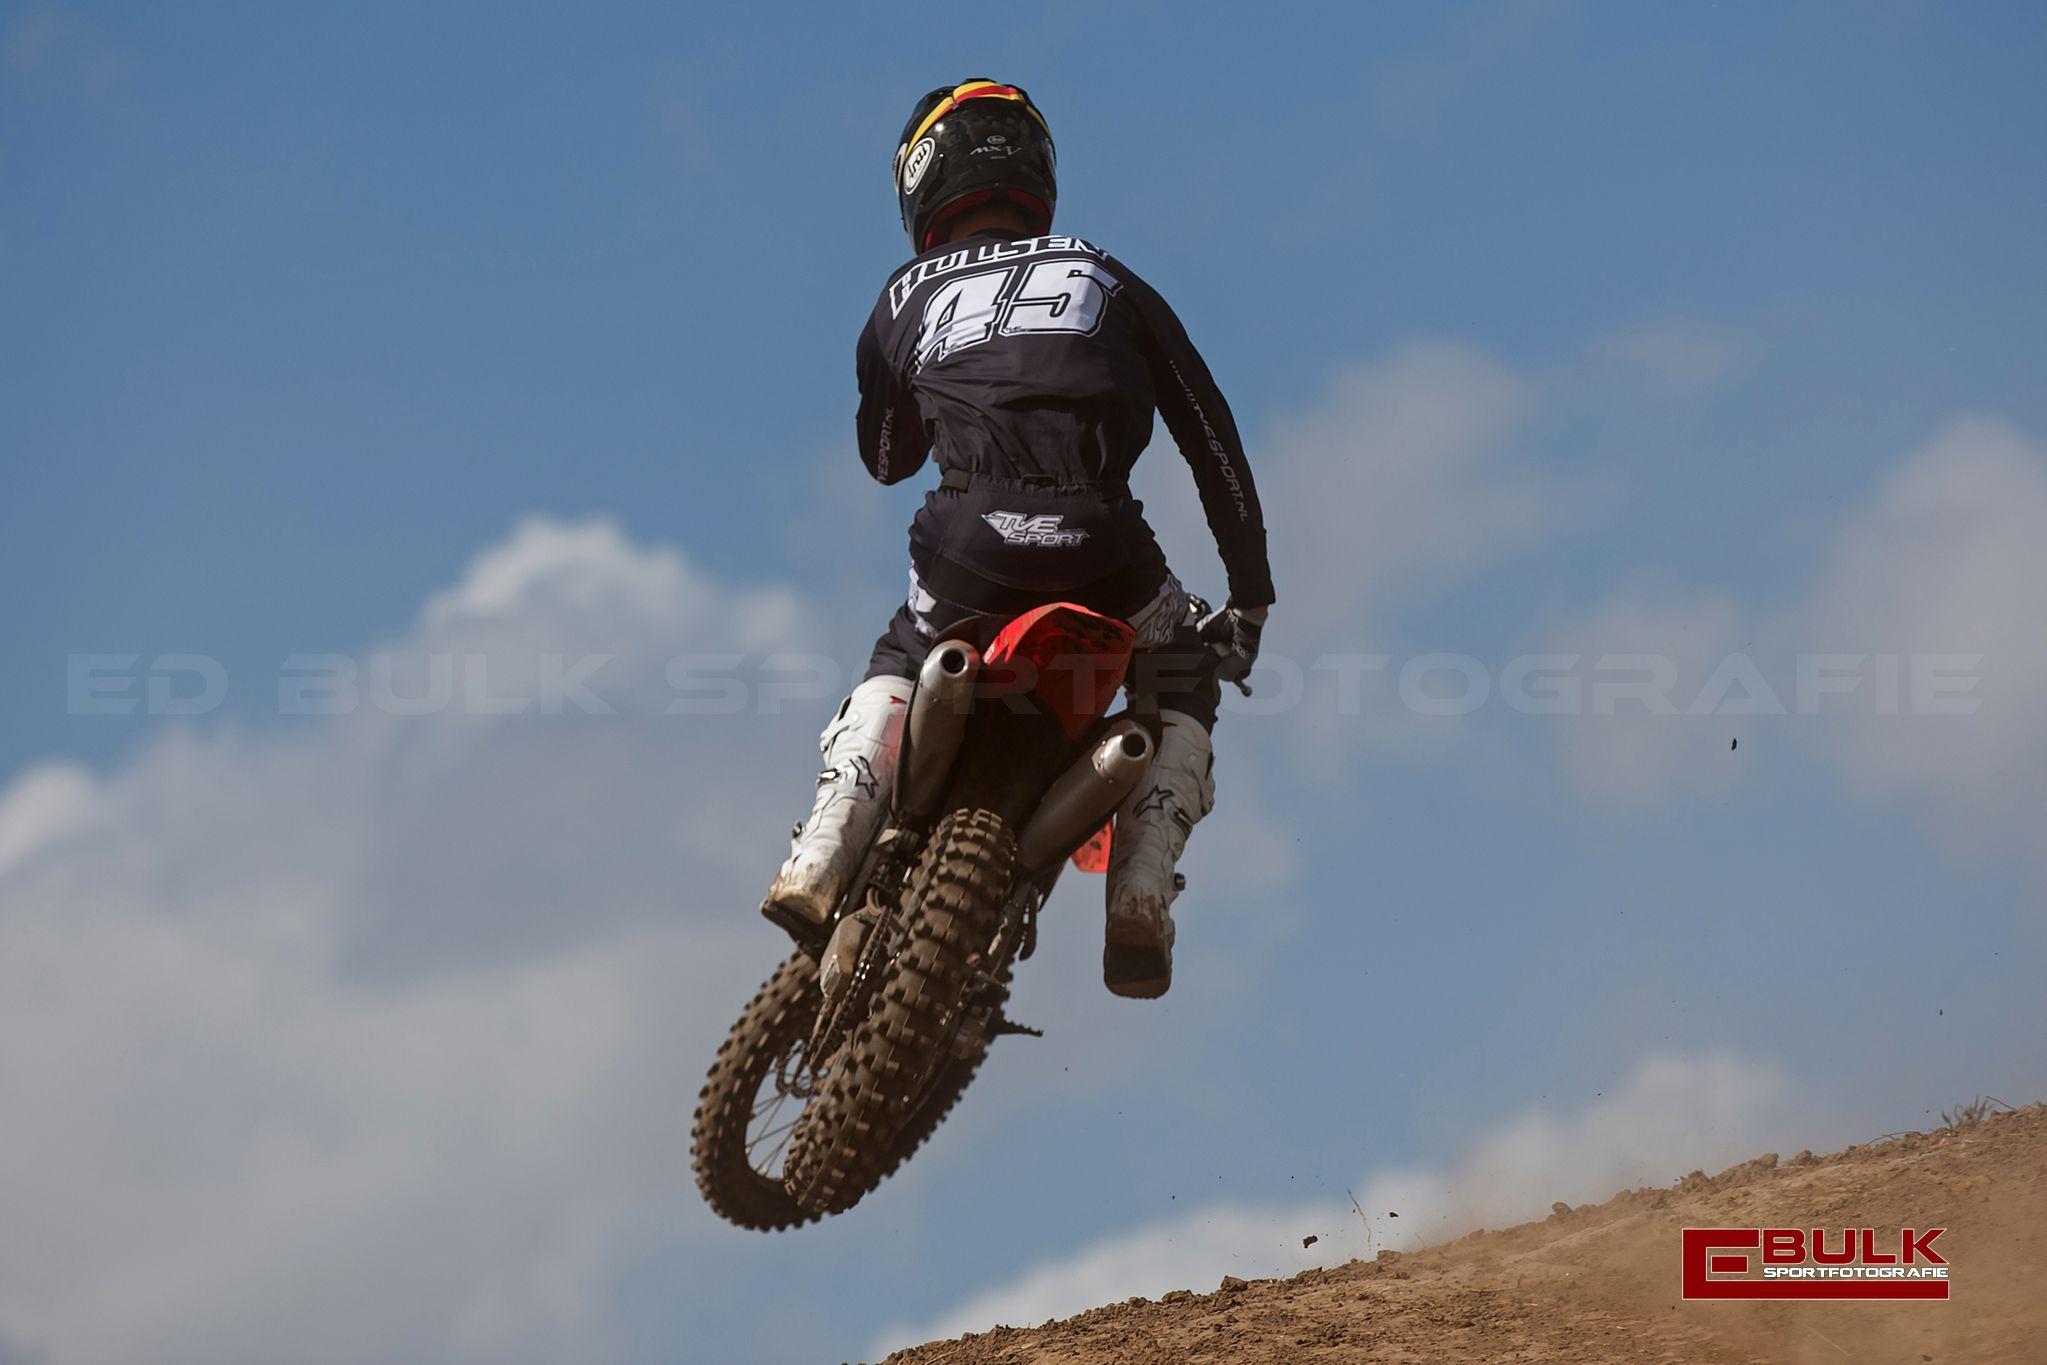 ebs_0462-ed_bulk_sportfotografie